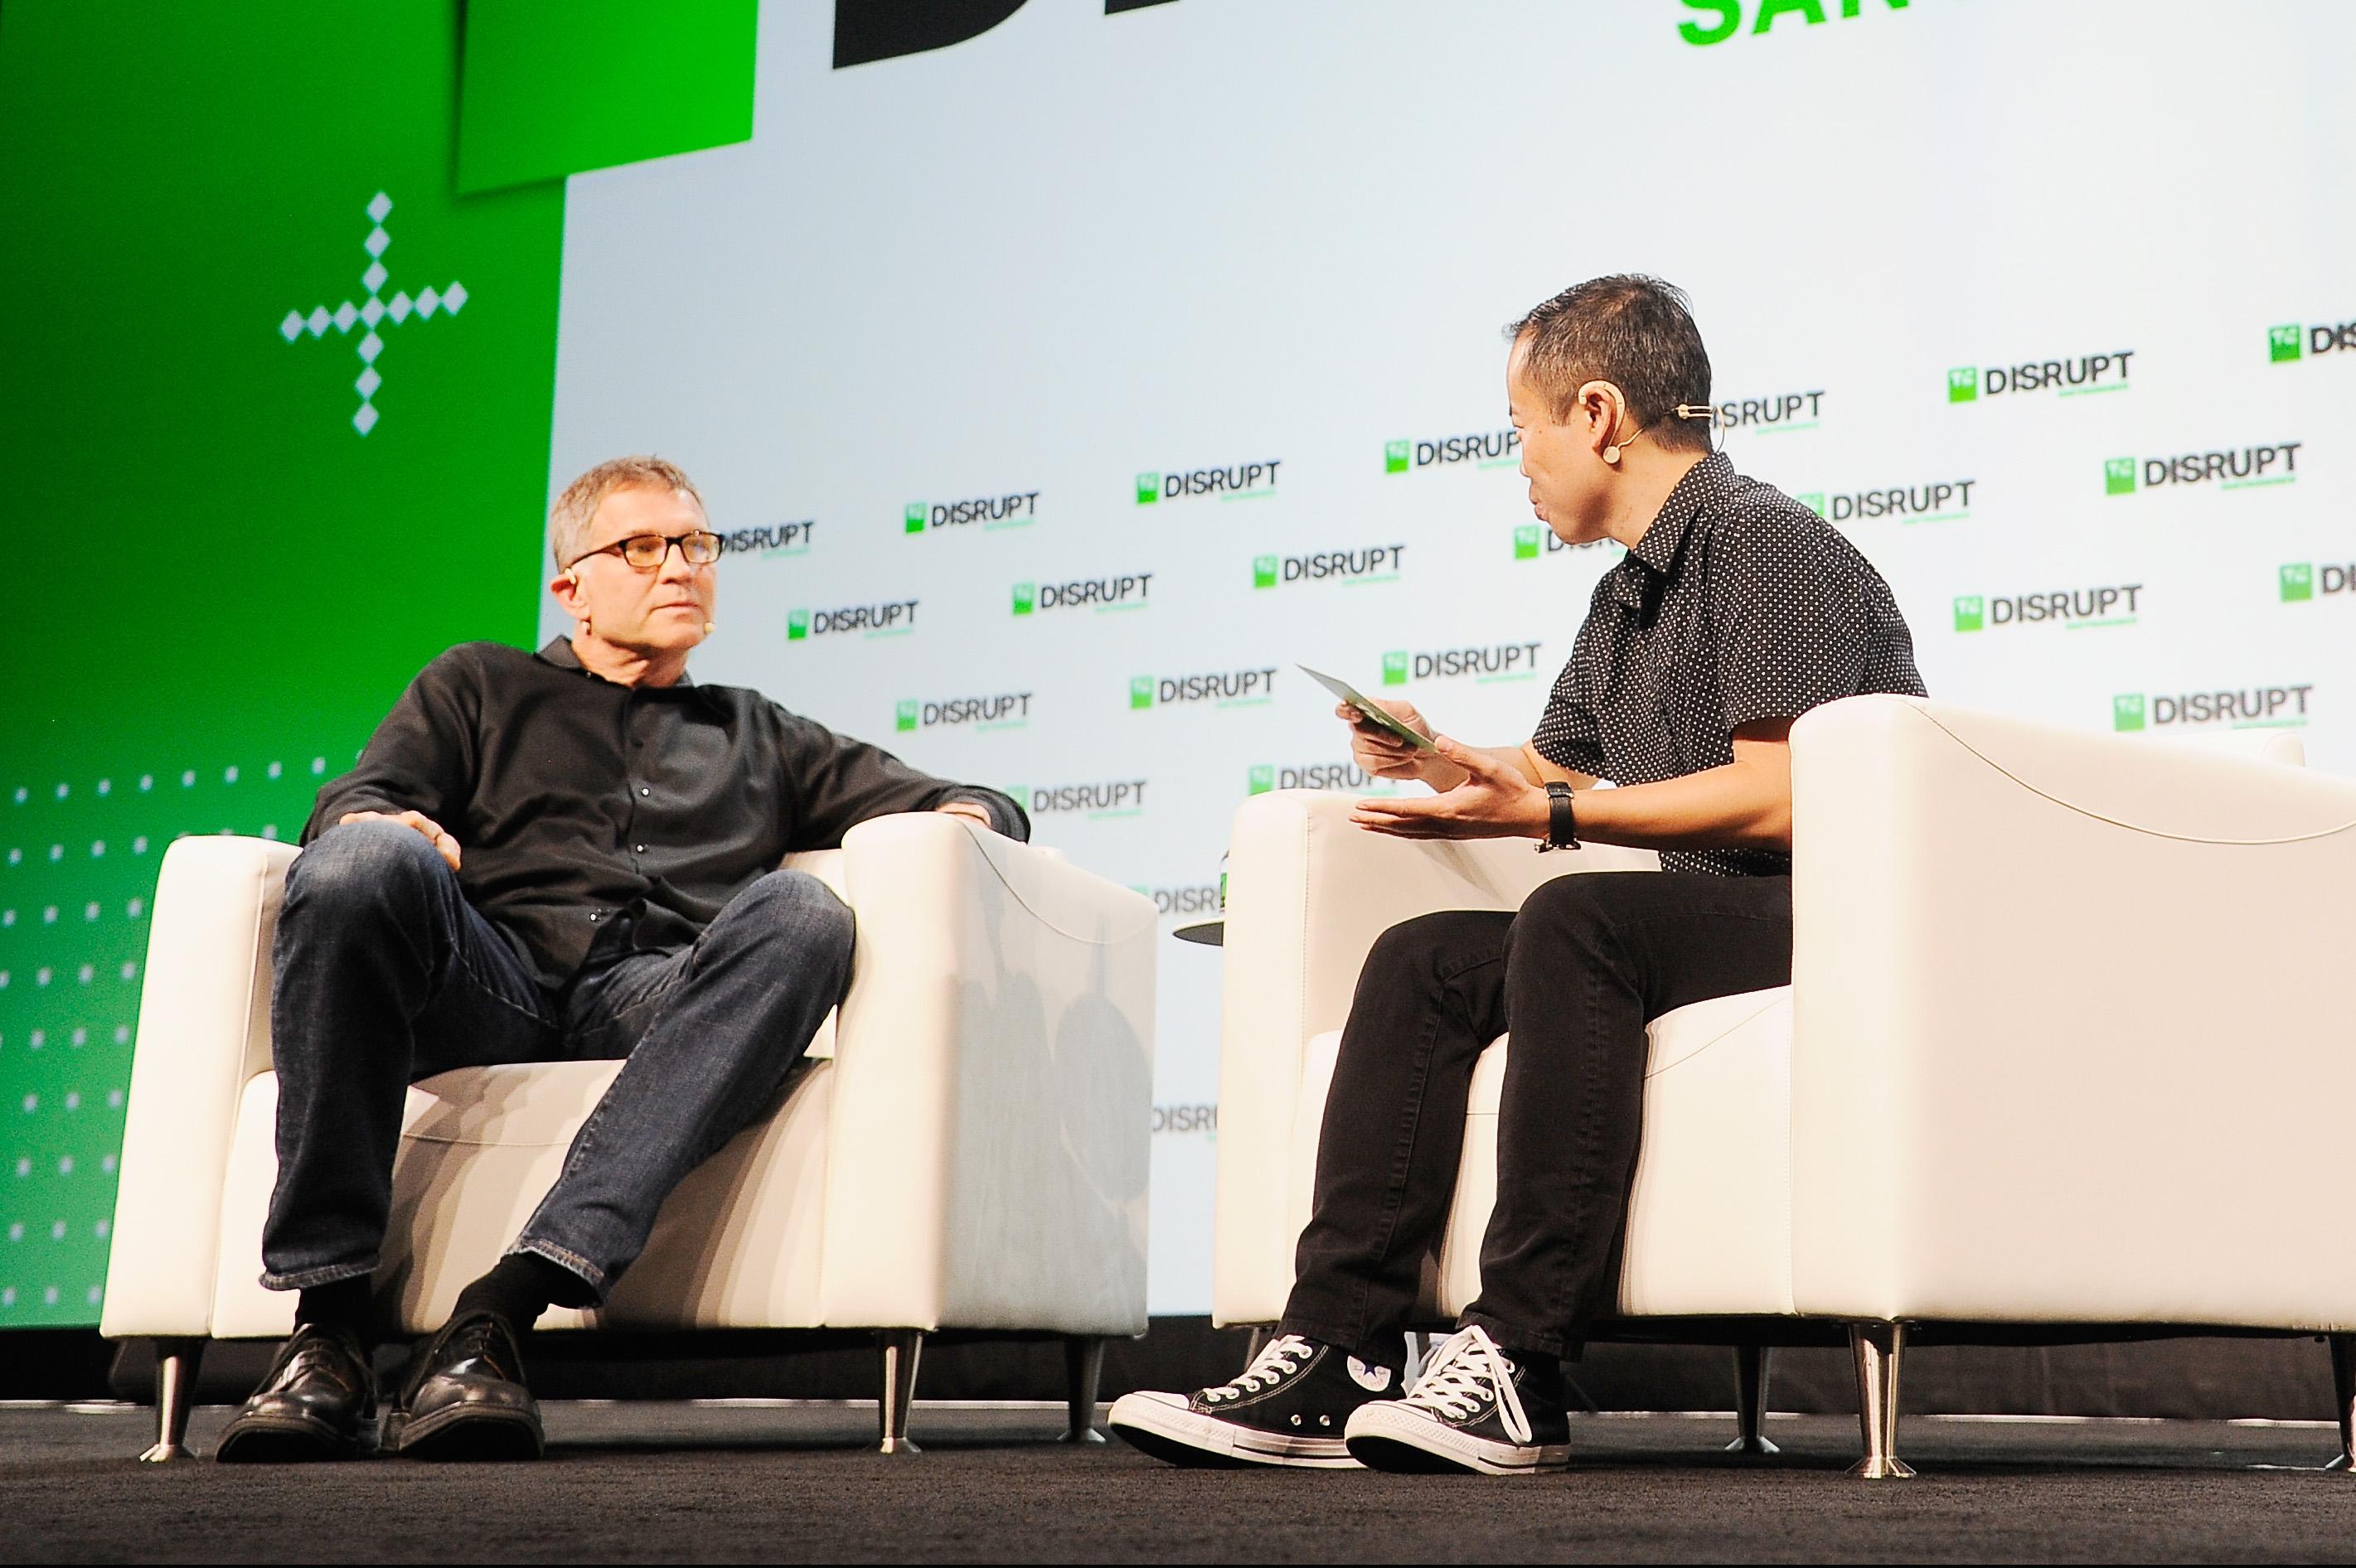 Francisco 2018 - day 1 (30633299218).jpg SAN FRANCISCO, CA - SEPTEMBER 05: Roblox Corporation Founder and CEO David Baszucki (L) and moderator Anthony Ha